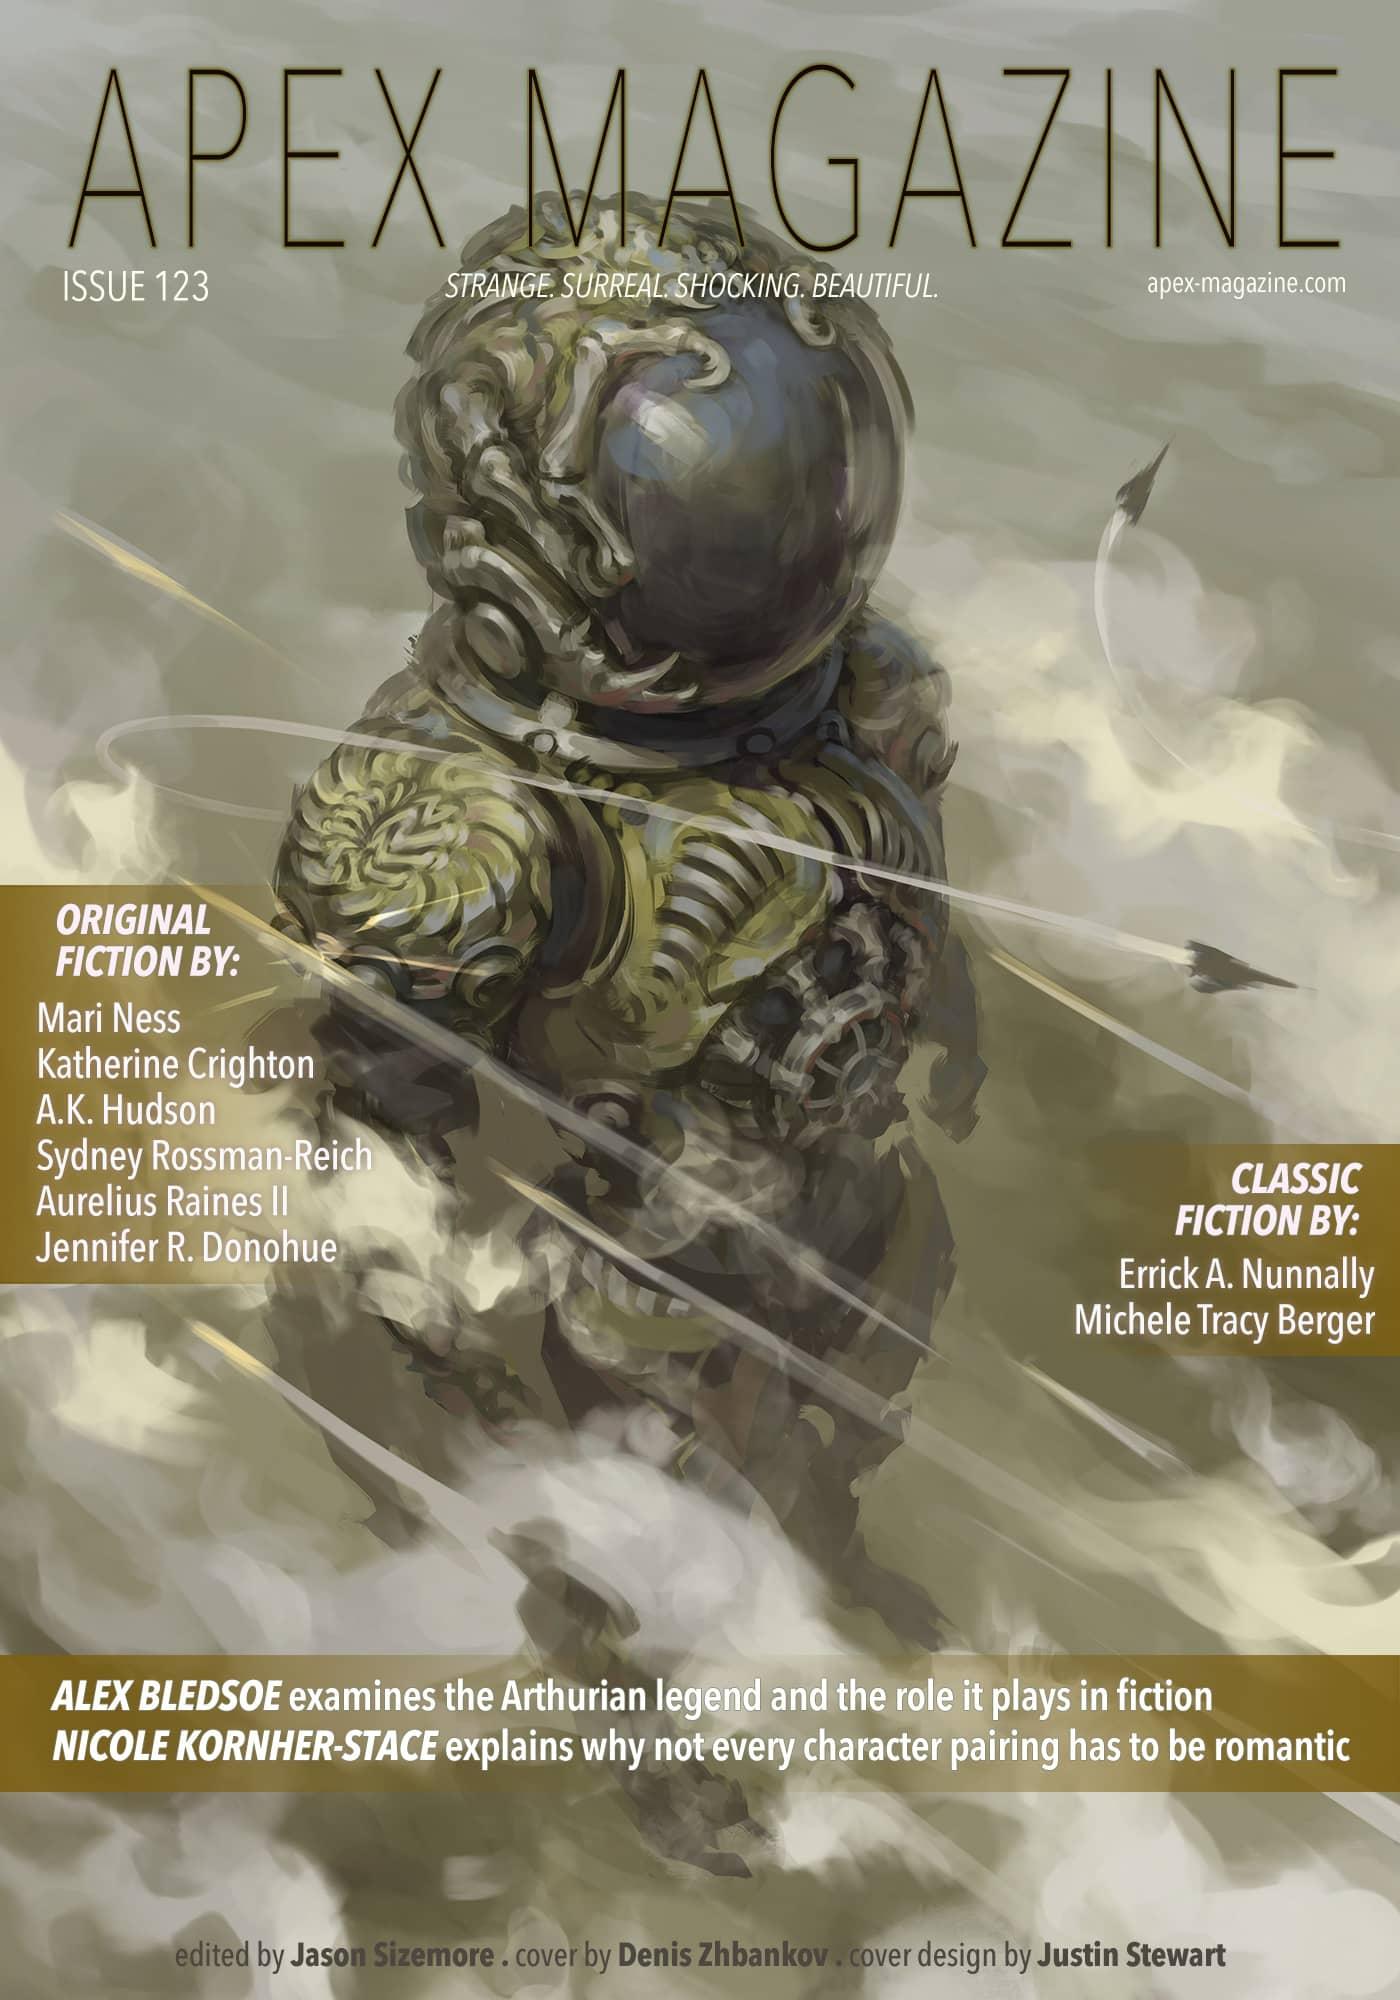 Apex Magazine Issue 123 by Jason Sizemore